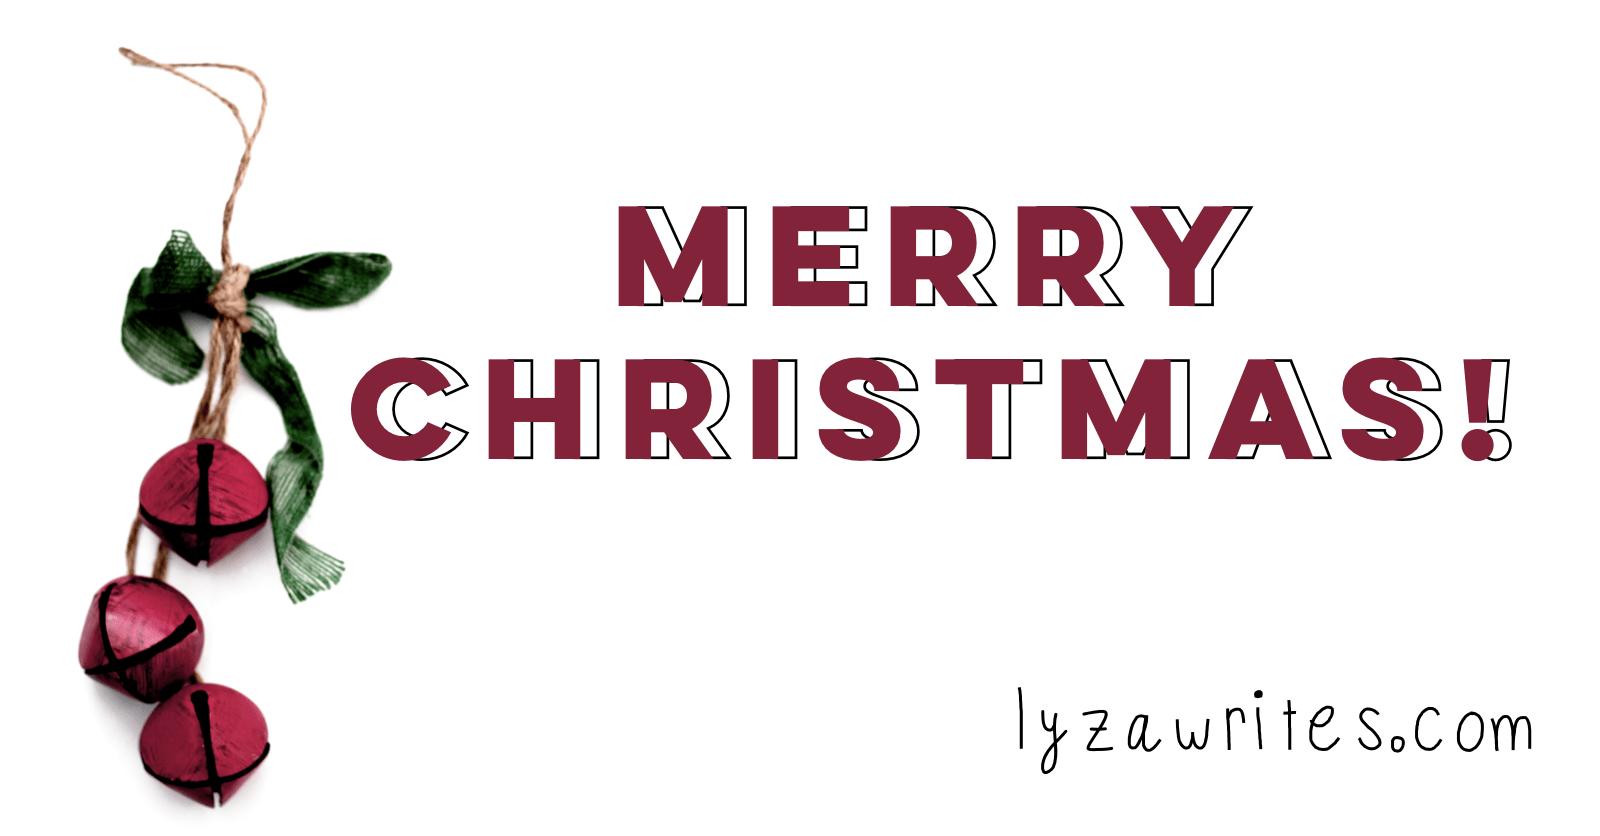 Merry 2019 CHRISTmas!